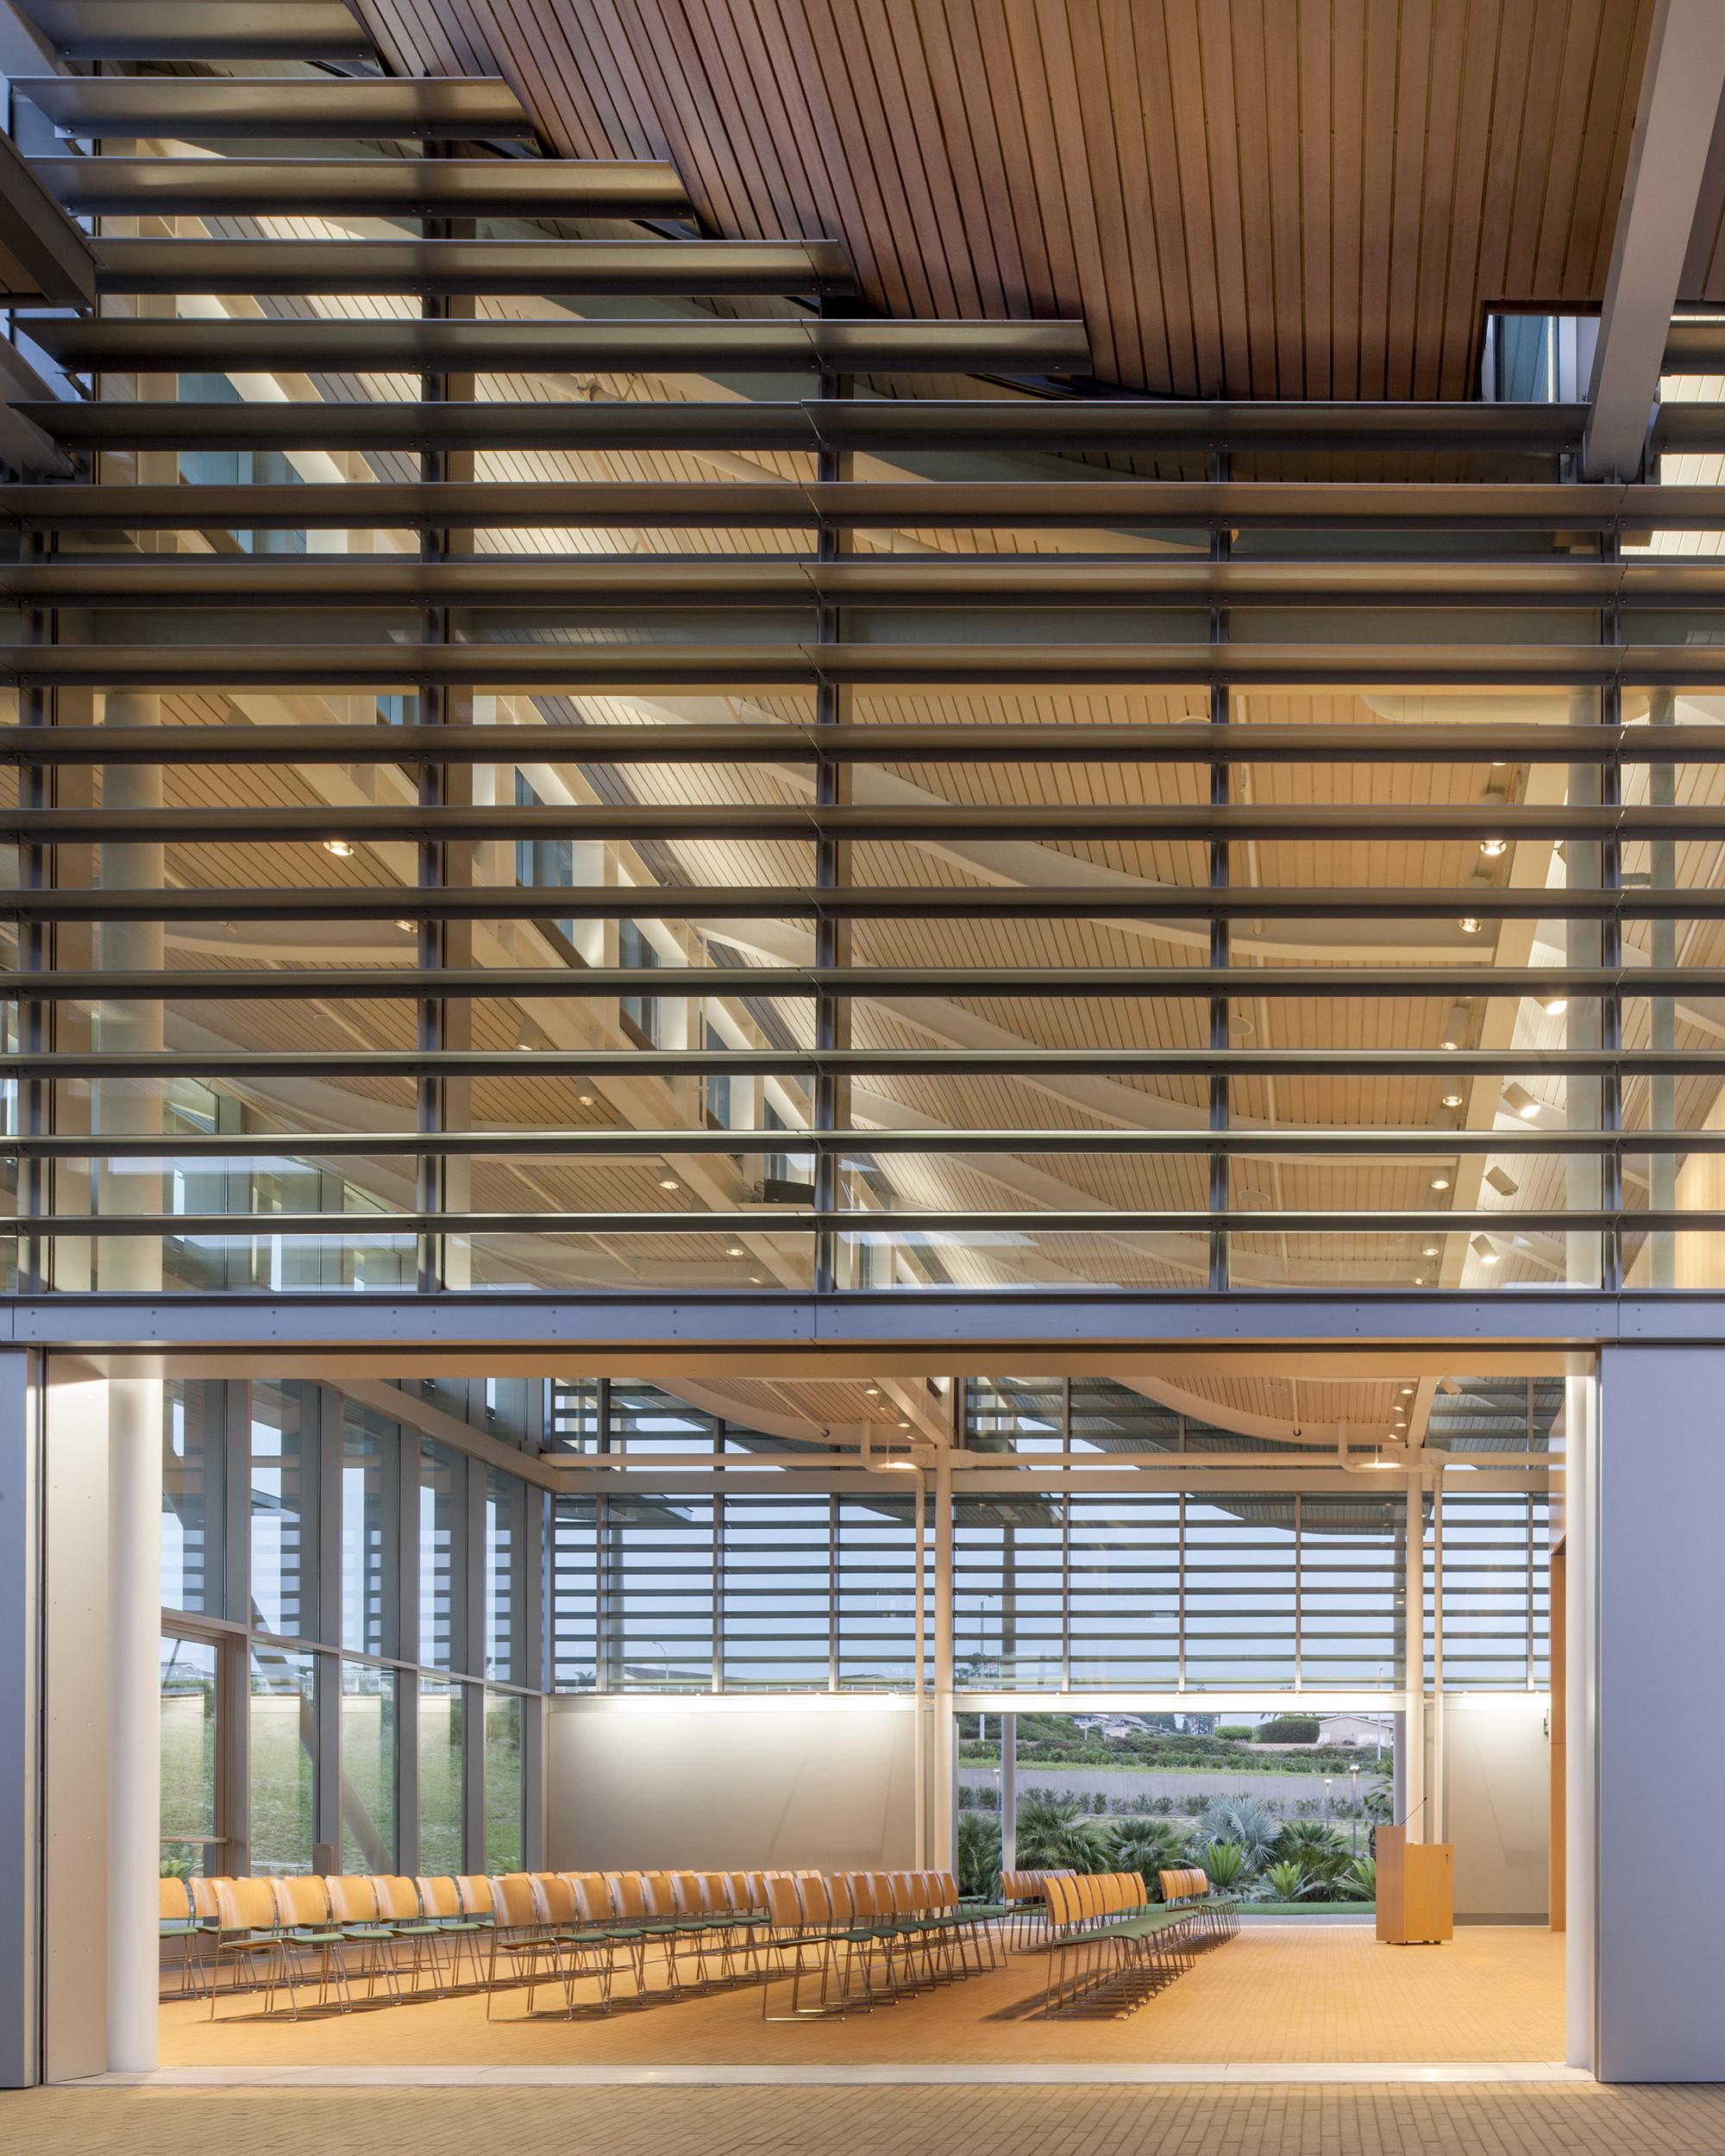 2015 AIA Institute Honor Awards For Interior Architecture